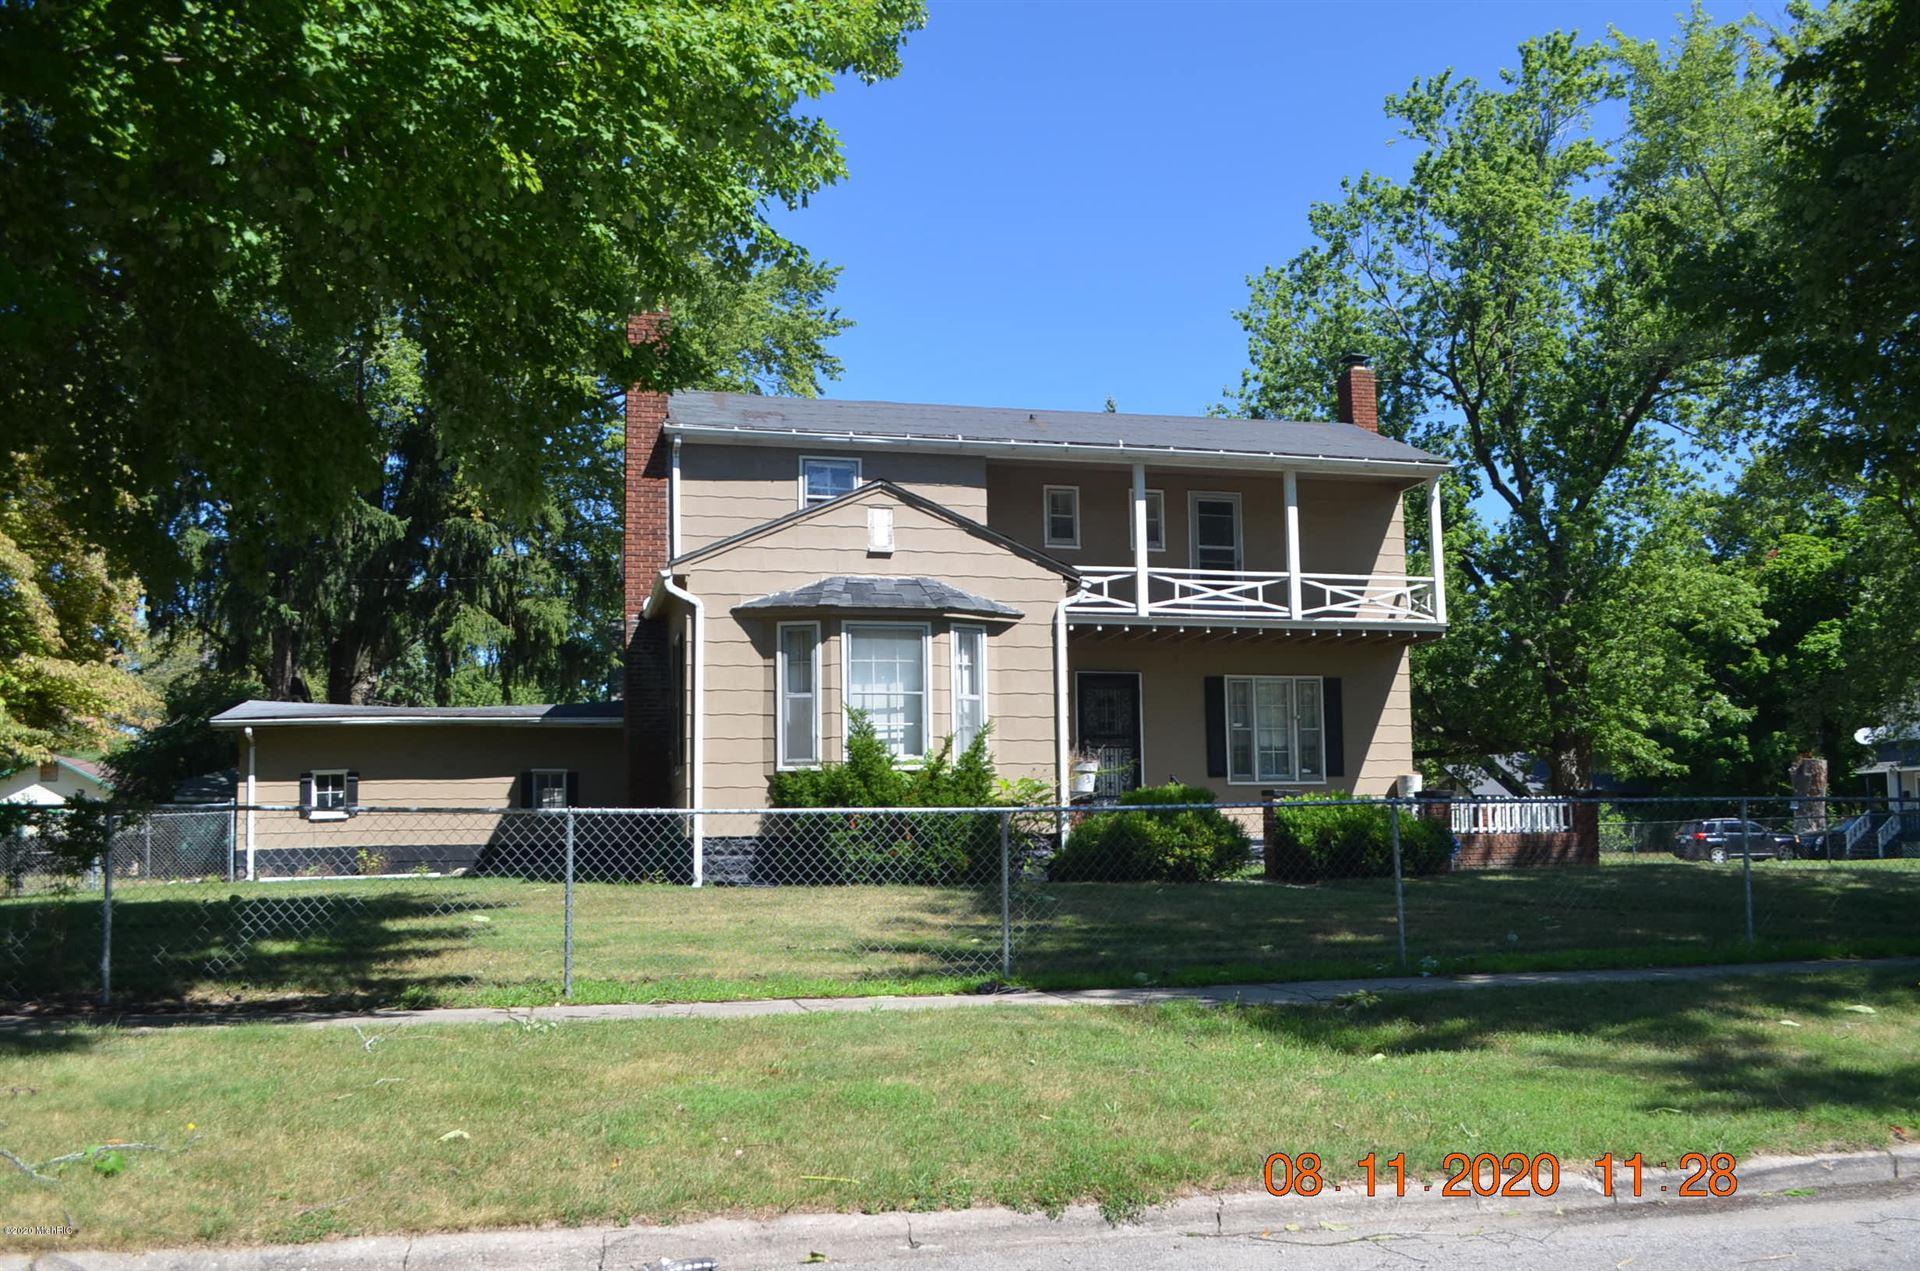 131 Clay Street, Benton Harbor, MI 49022 - MLS#: 20033164